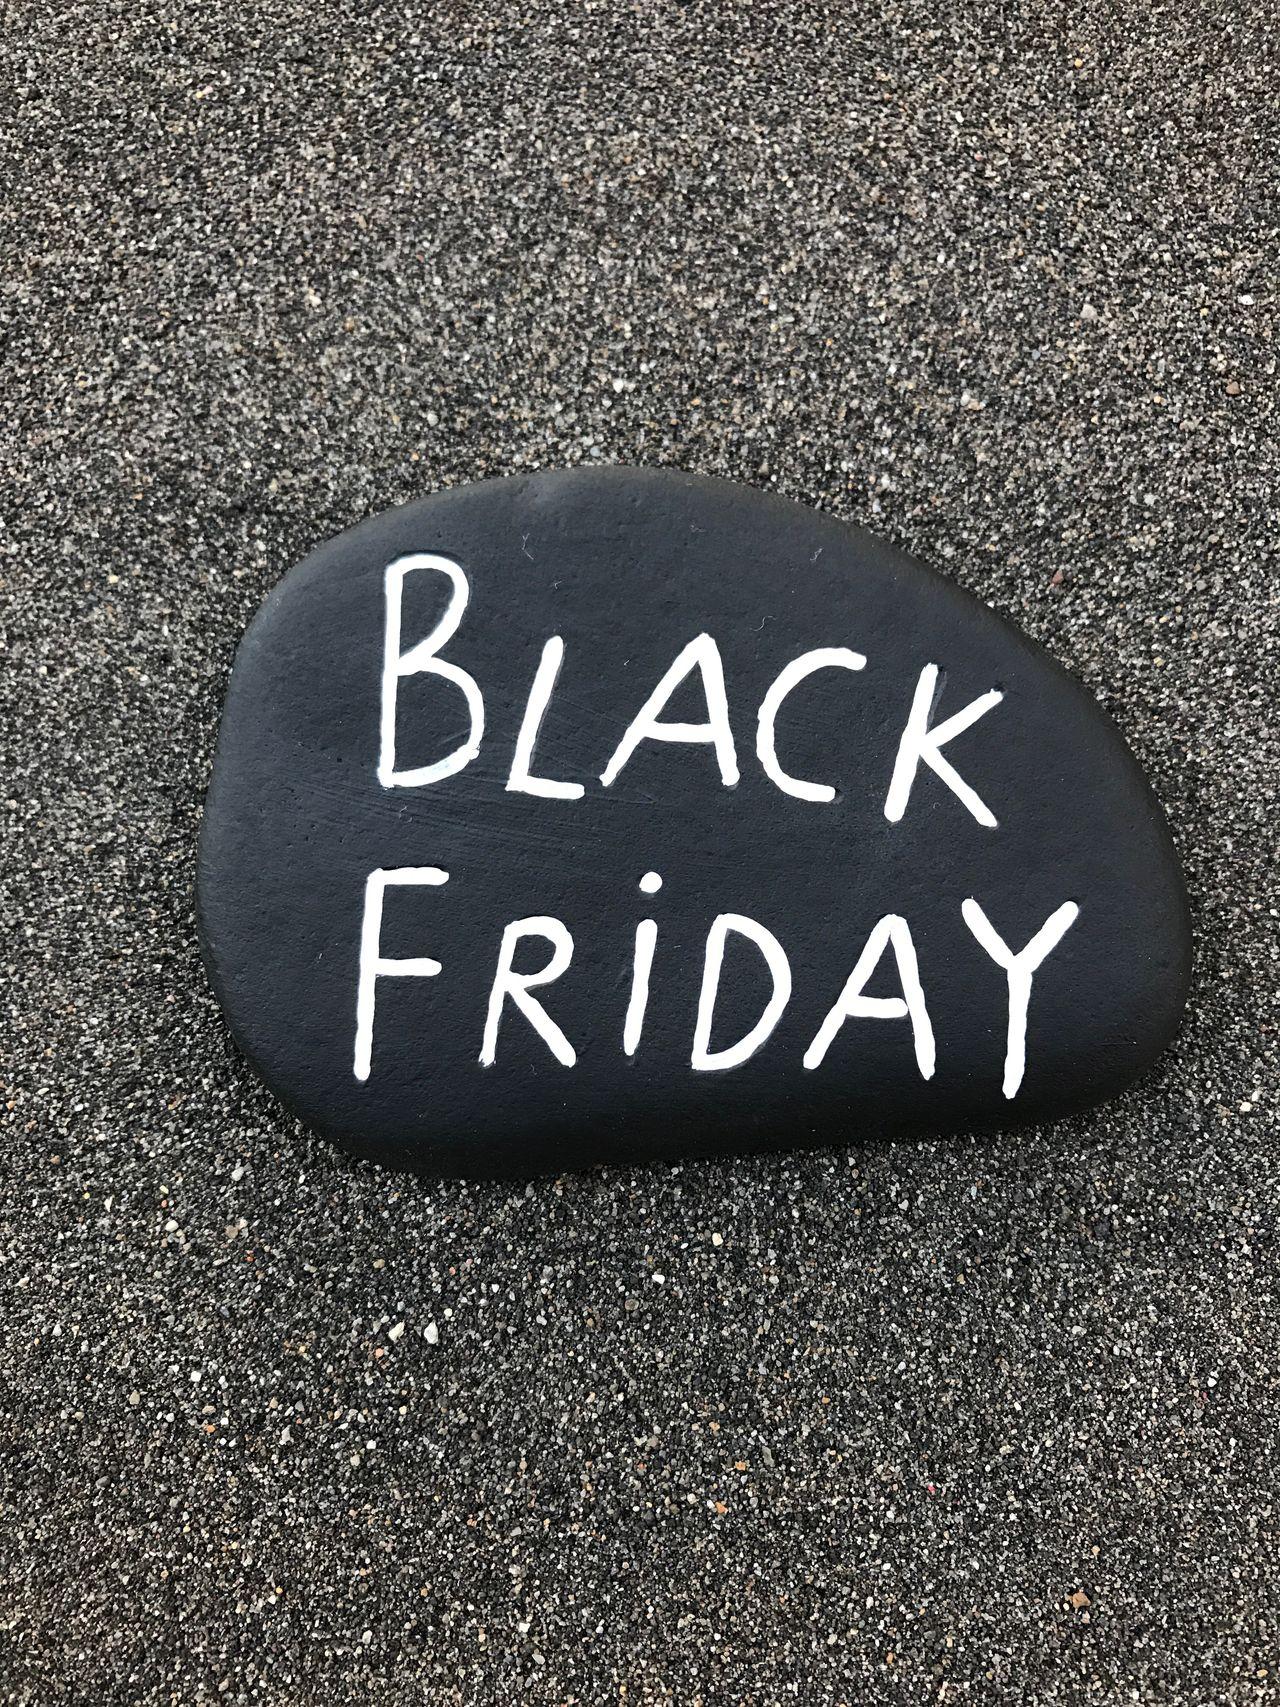 Black Friday day on a black stone Black Friday Black Friday Day Stone Sale Marketing Background Commerce Sold Sand